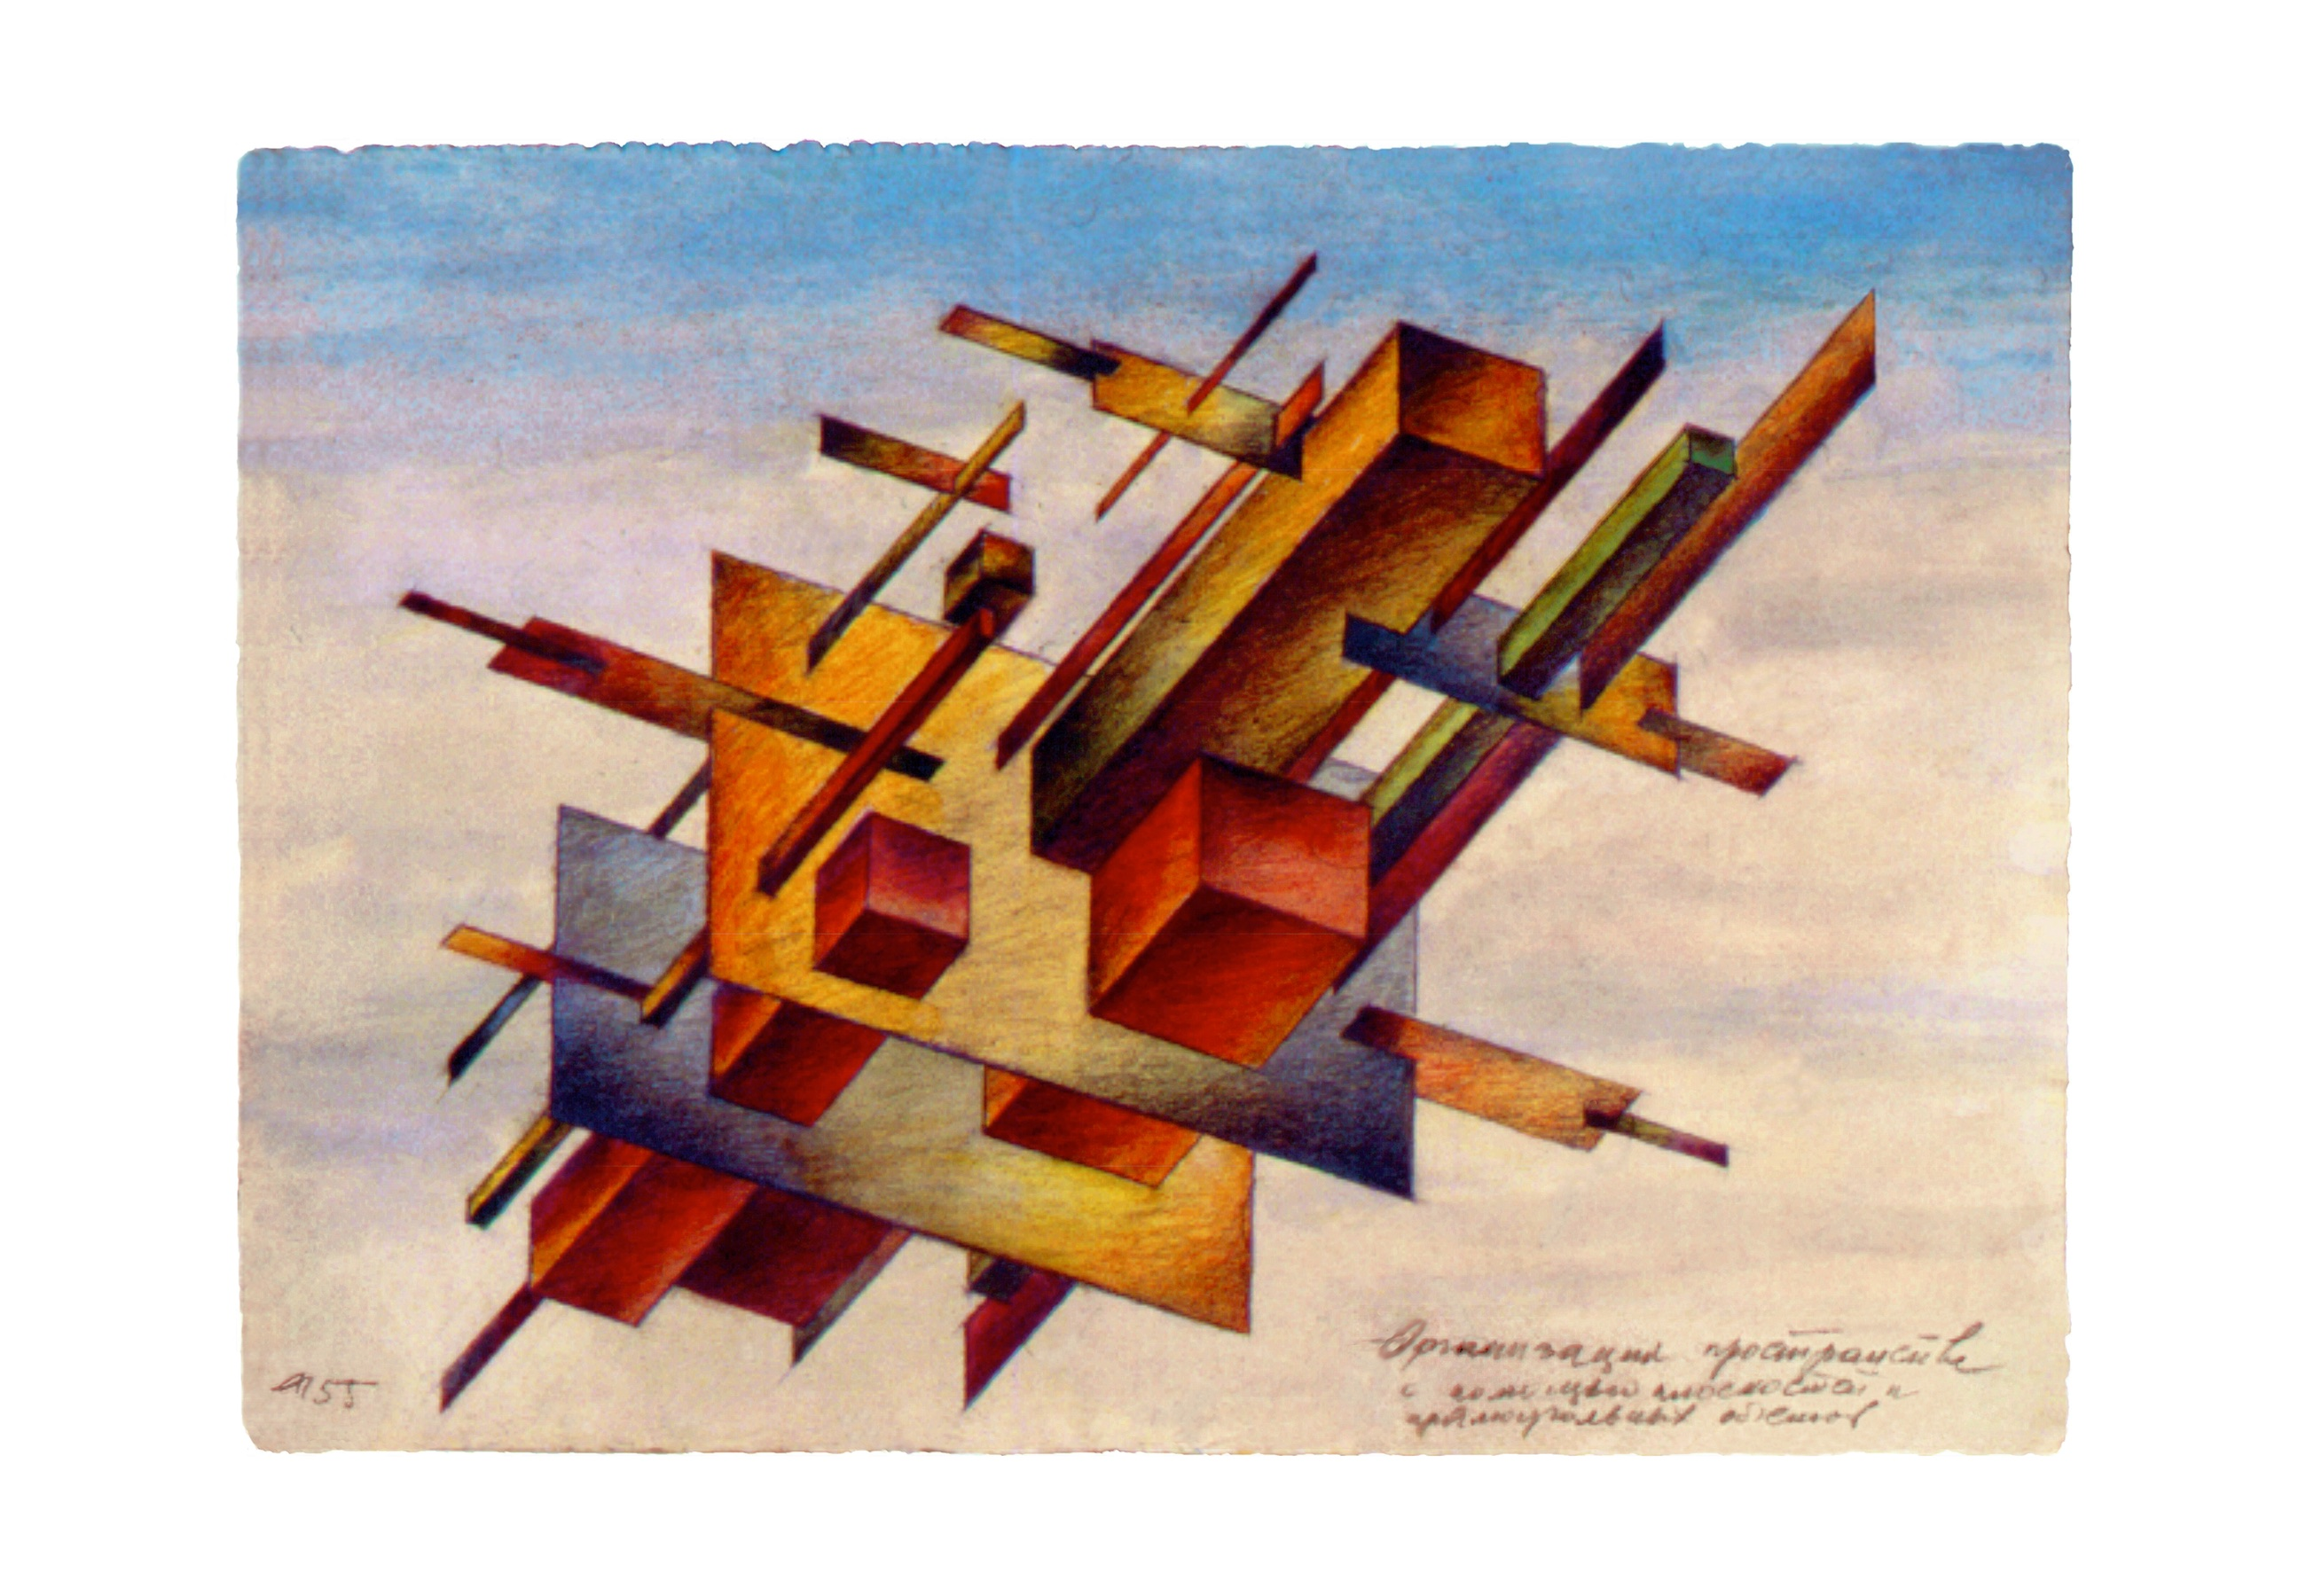 Lamm-Portfolio-1954-1955-26.jpg